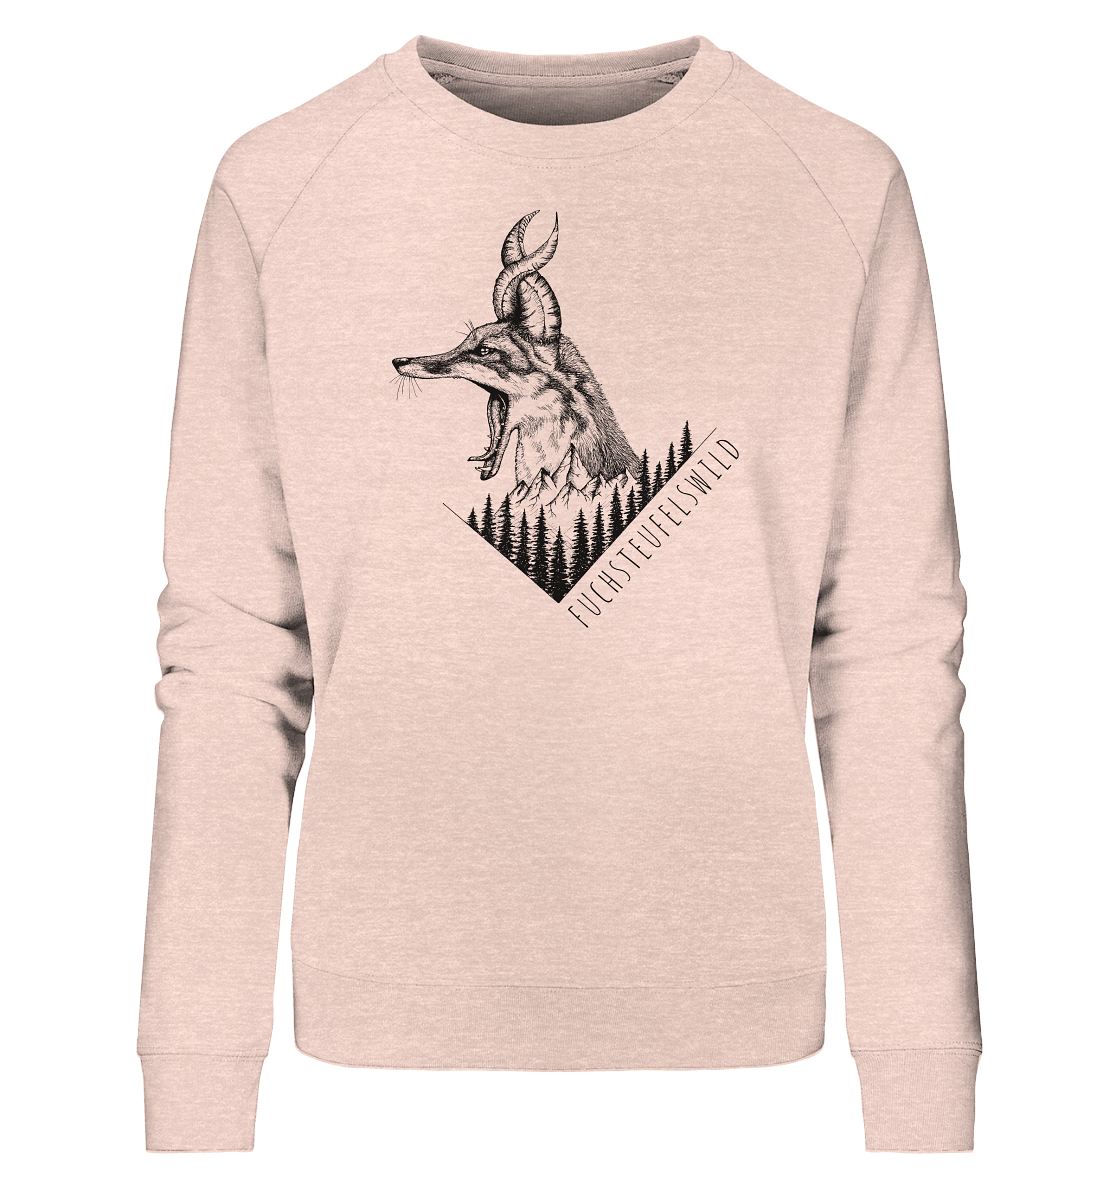 front-ladies-organic-sweatshirt-ffded6-1116x-4.png